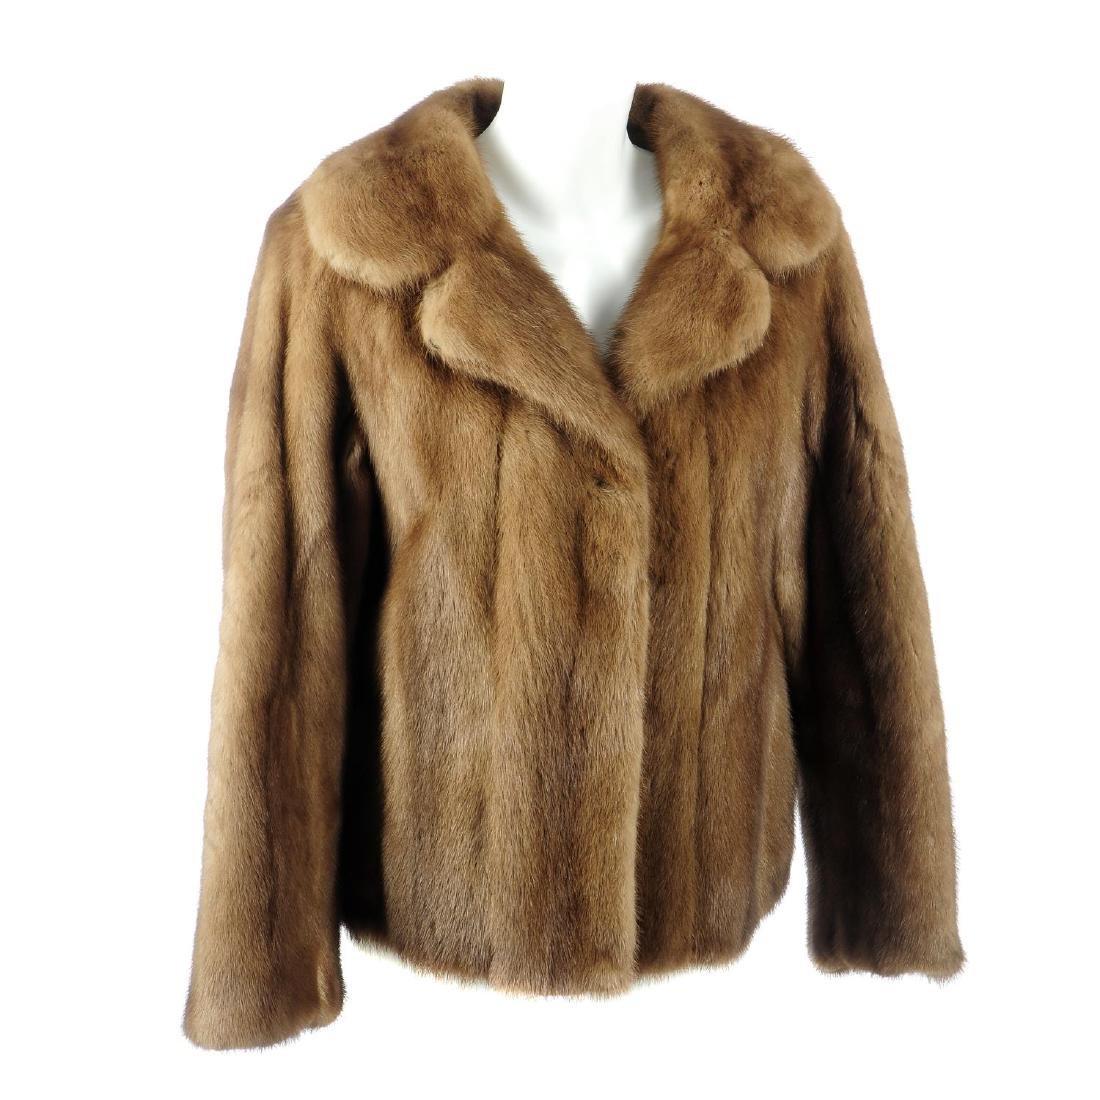 A demi buff mink jacket. Featuring a notched lapel